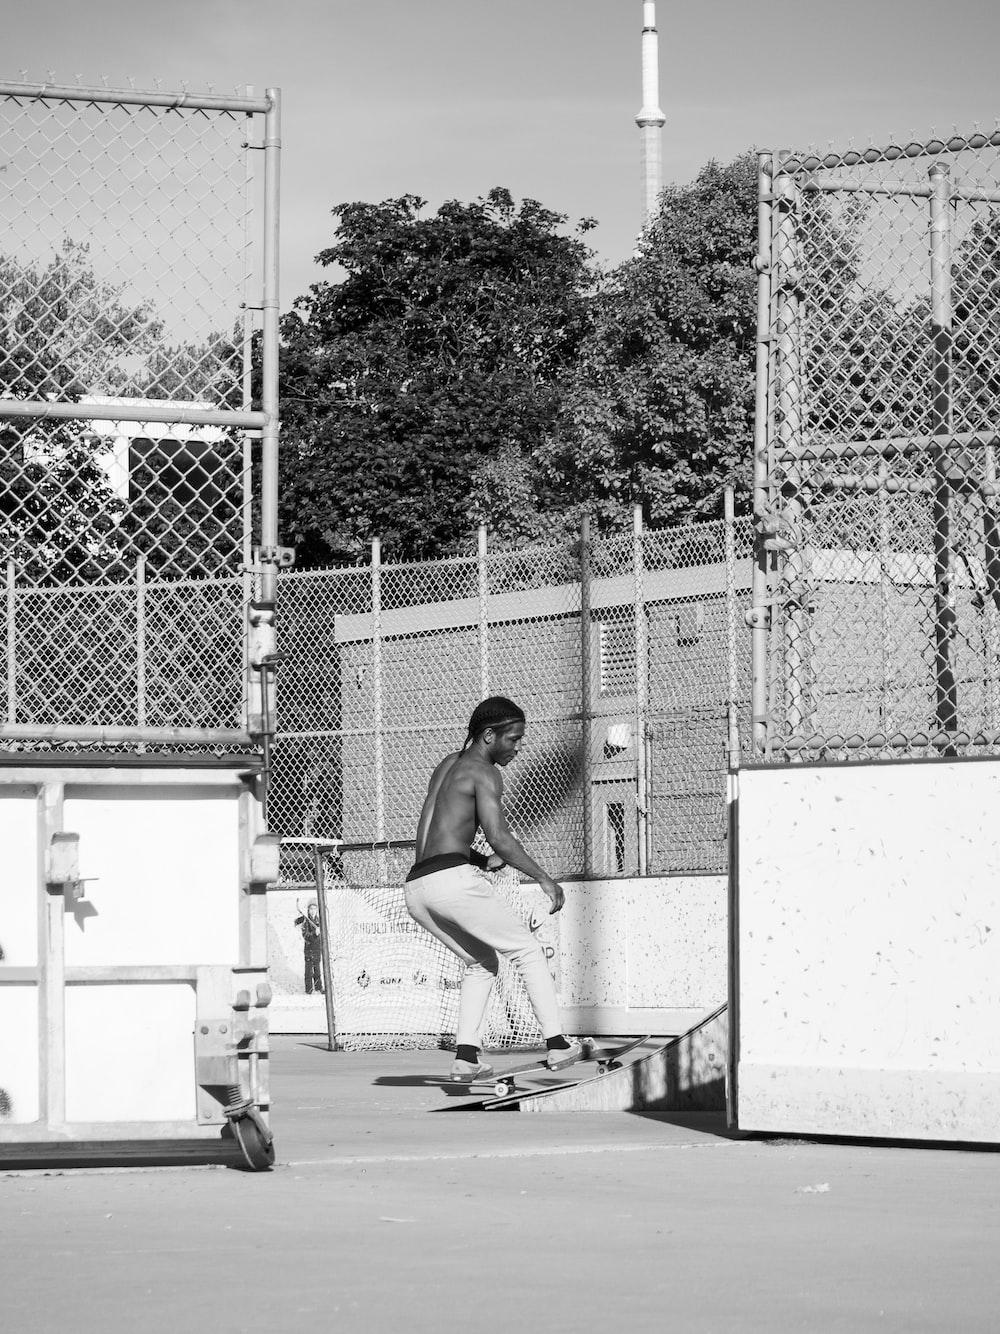 grayscale photo of man skateboarding